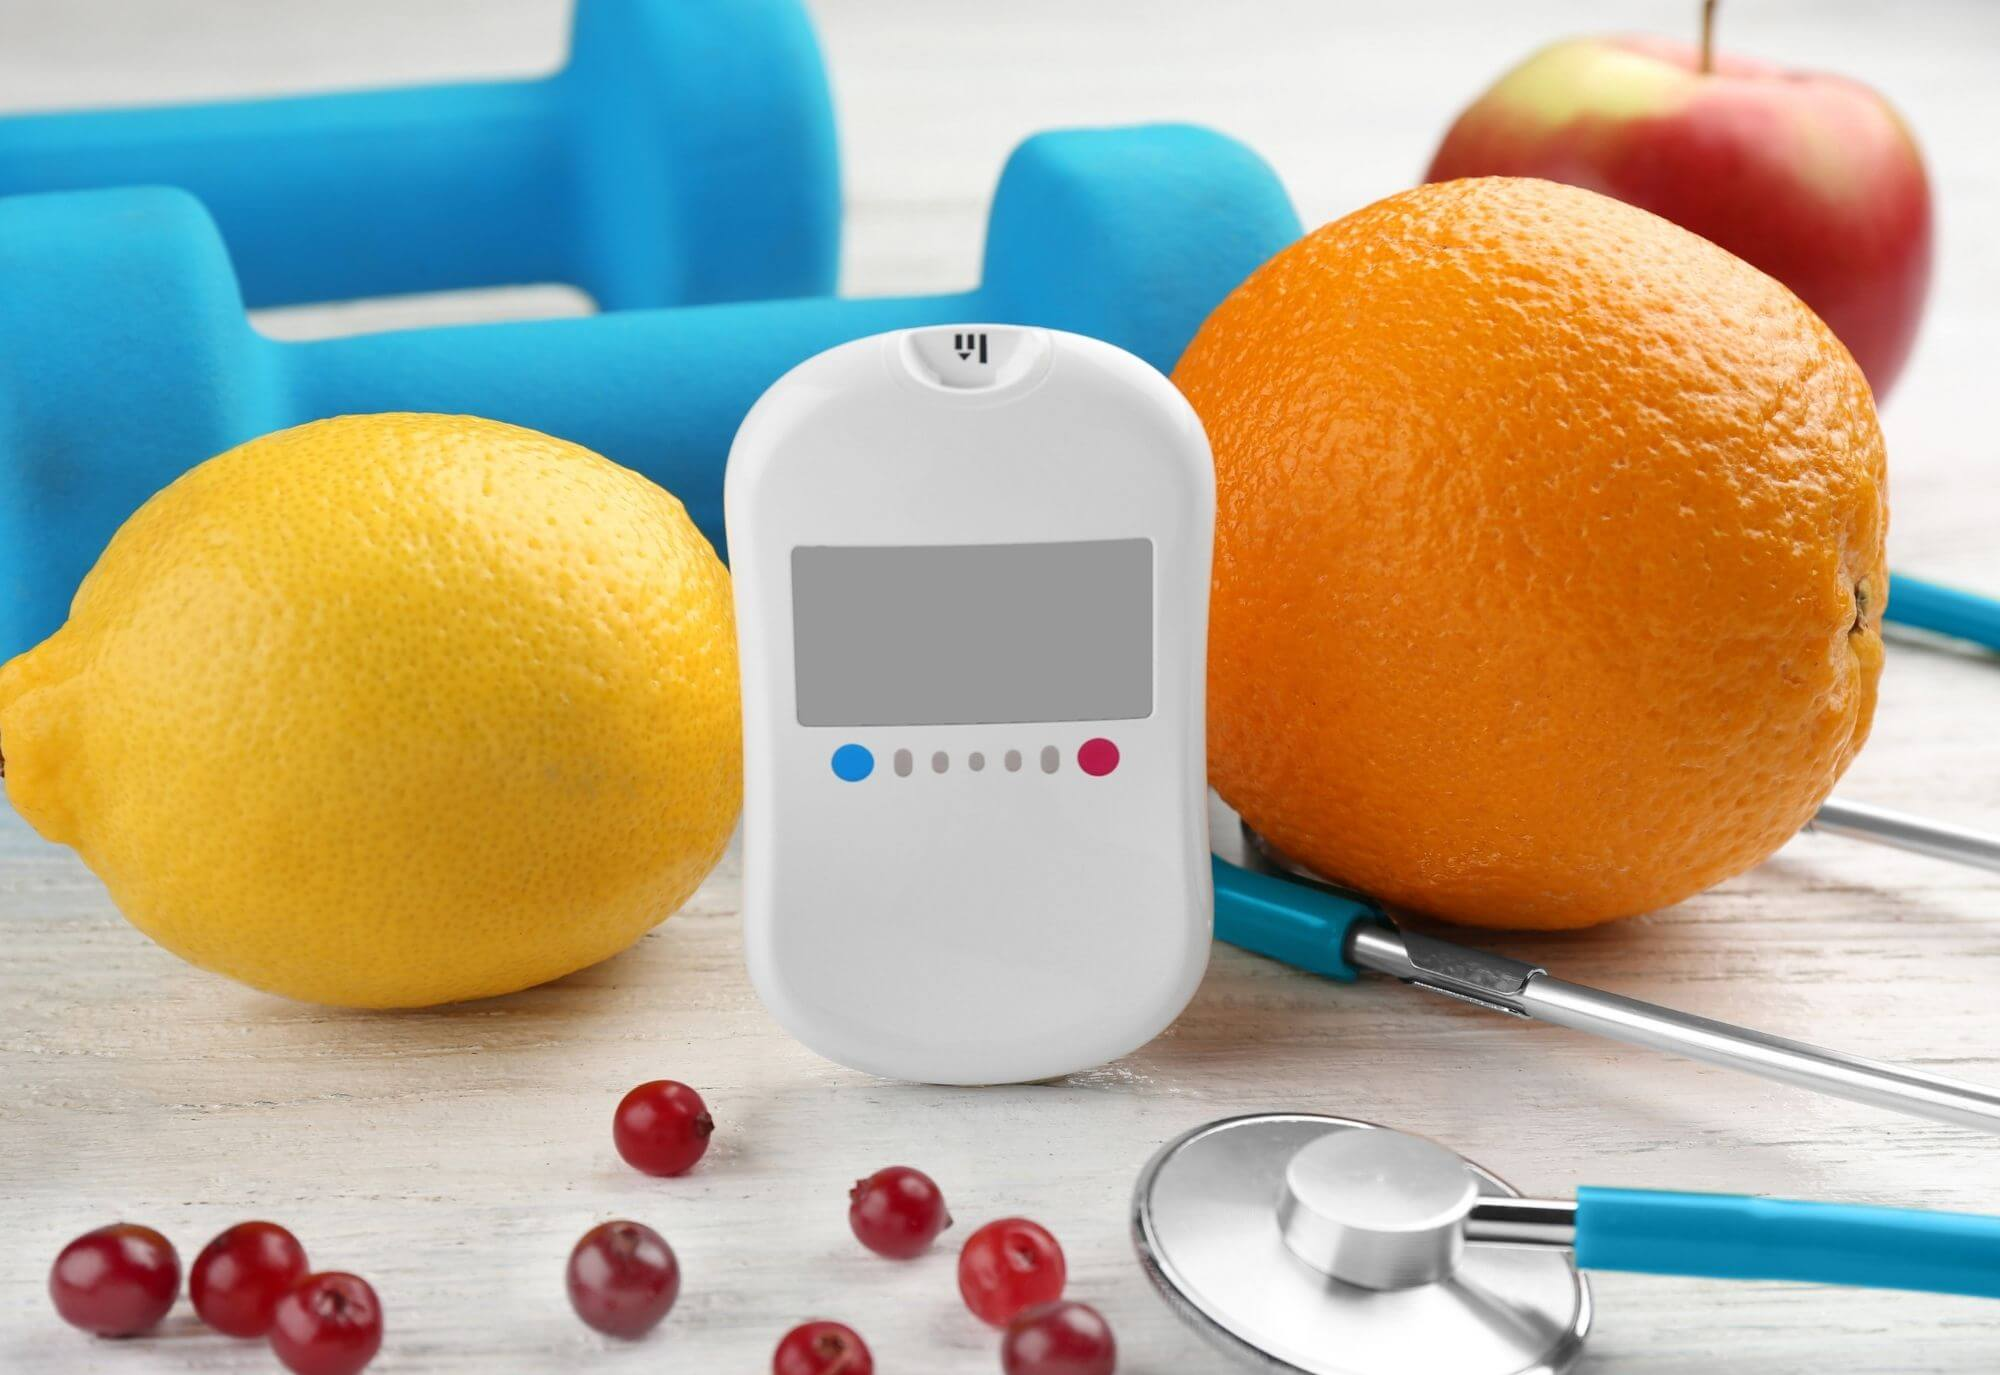 Lemon and orange against diabetes